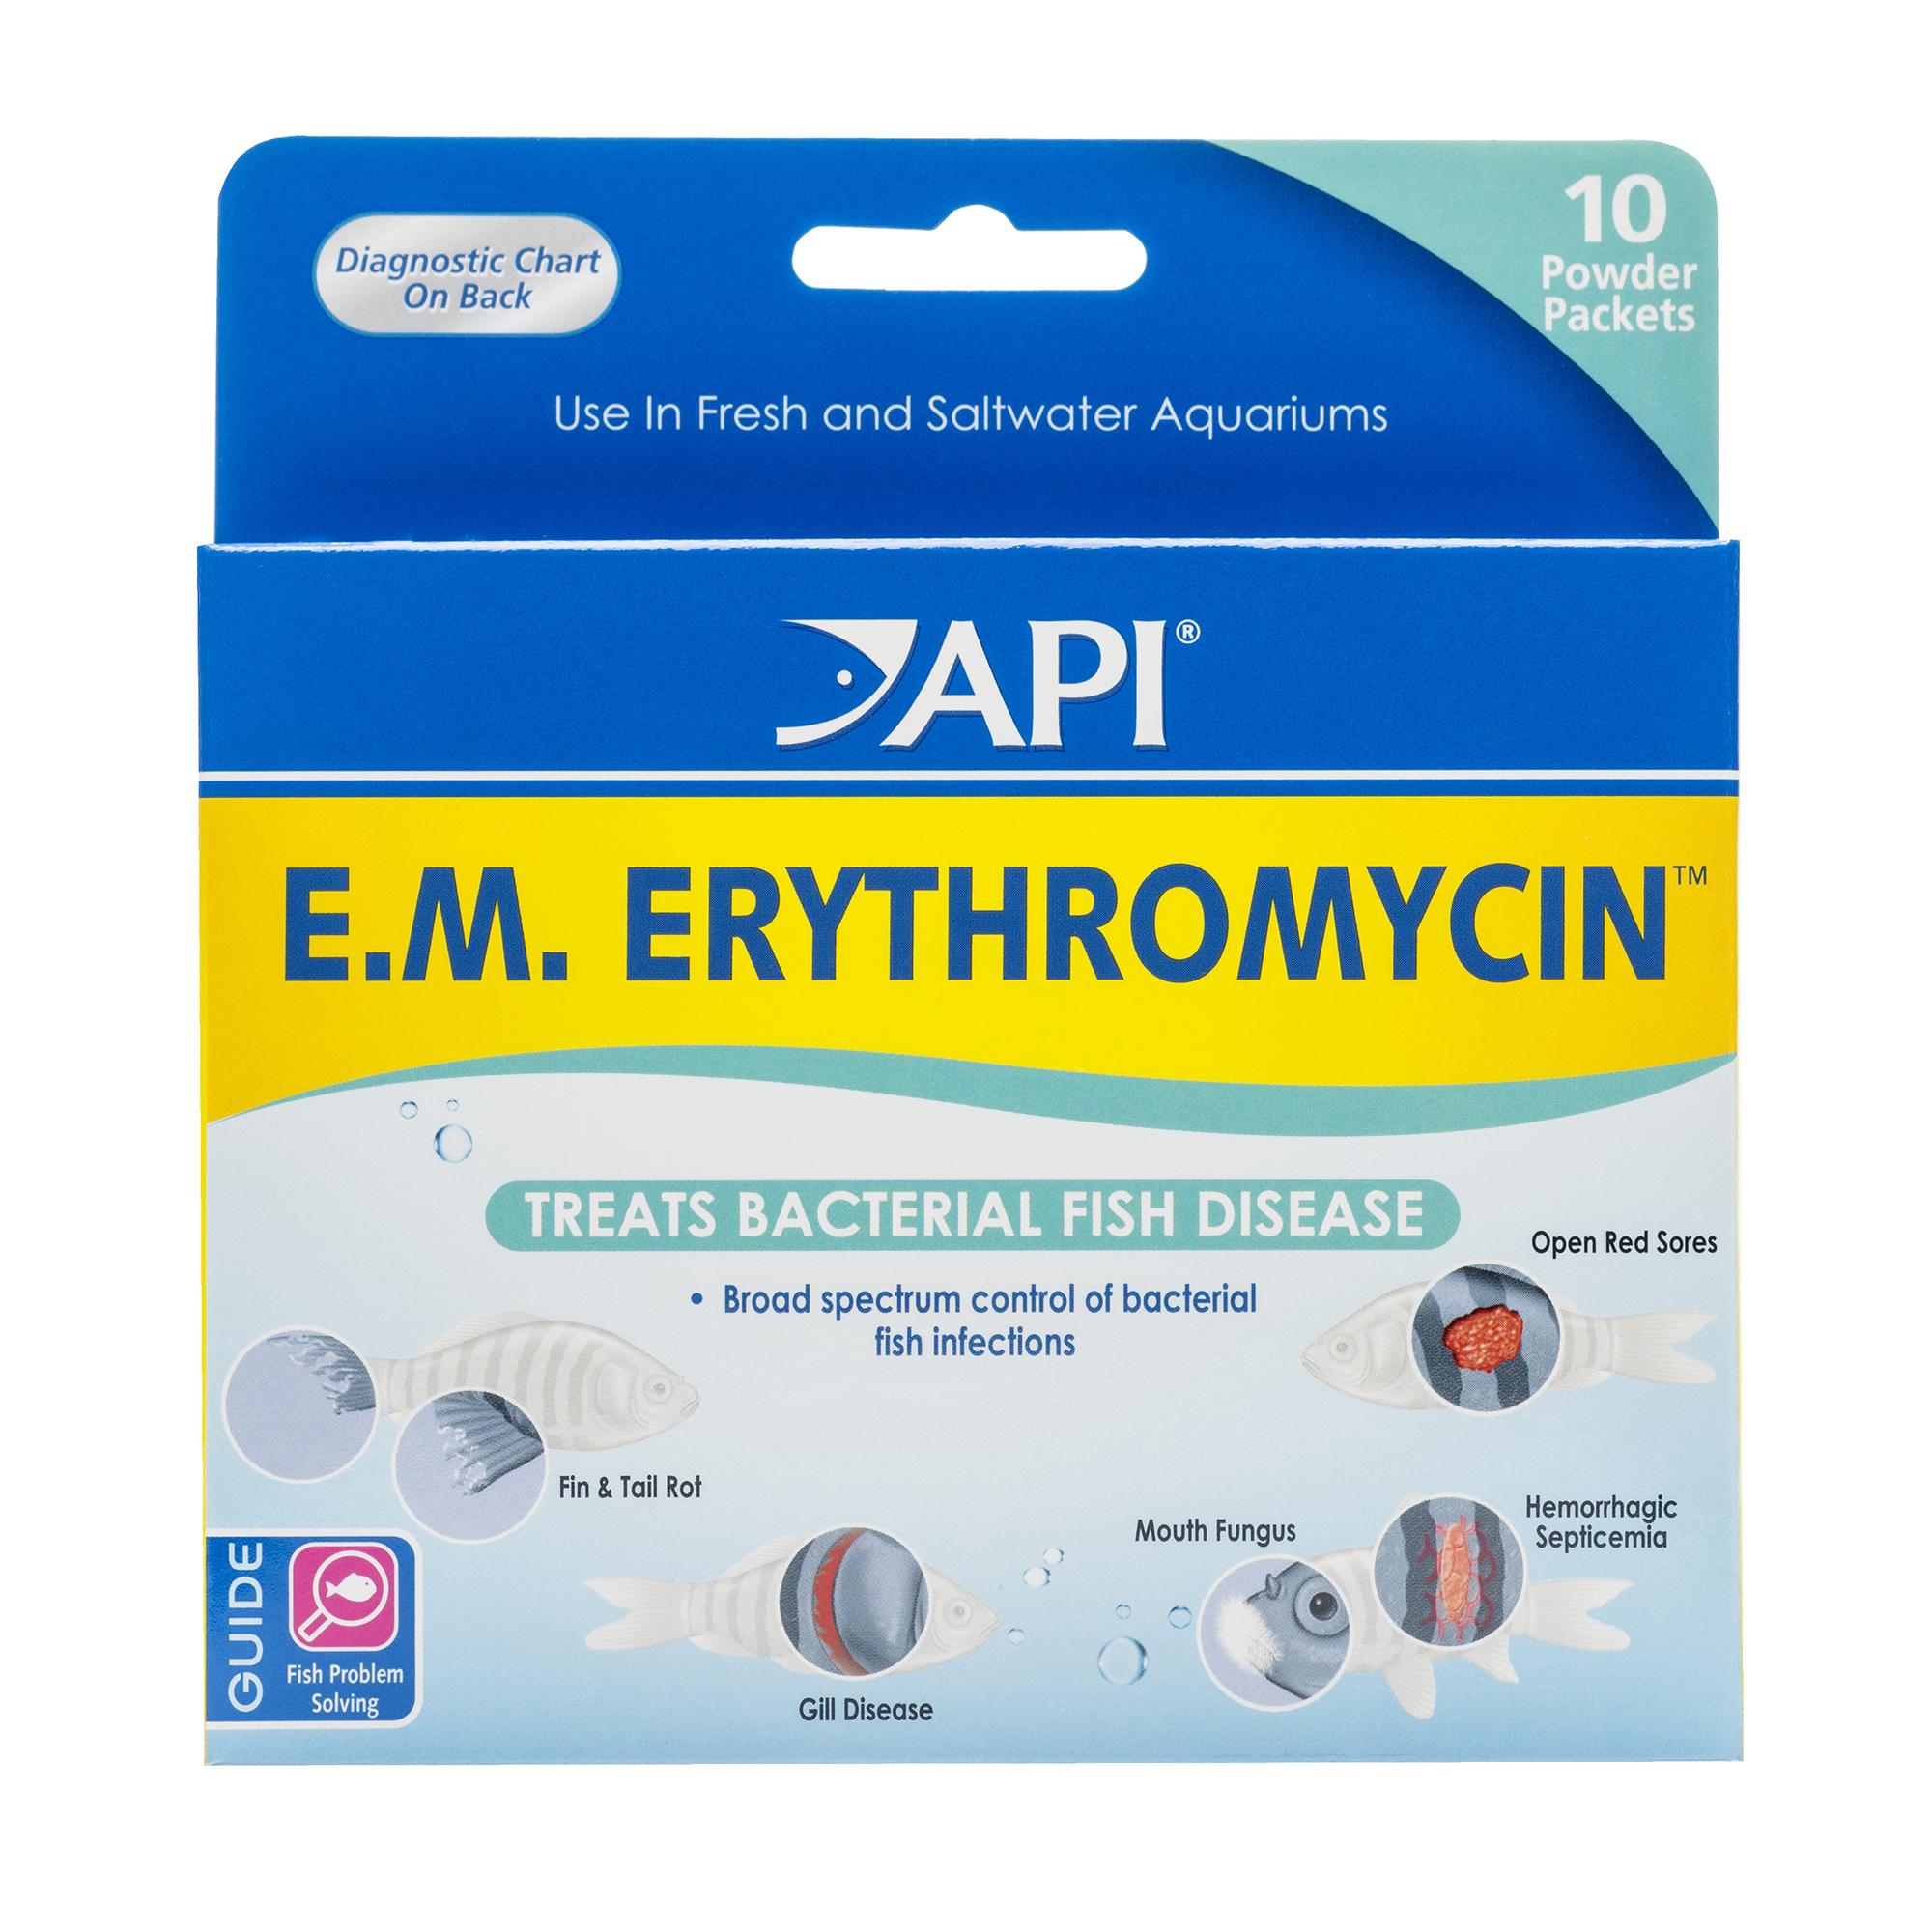 E.M. ERYTHROMYCIN™